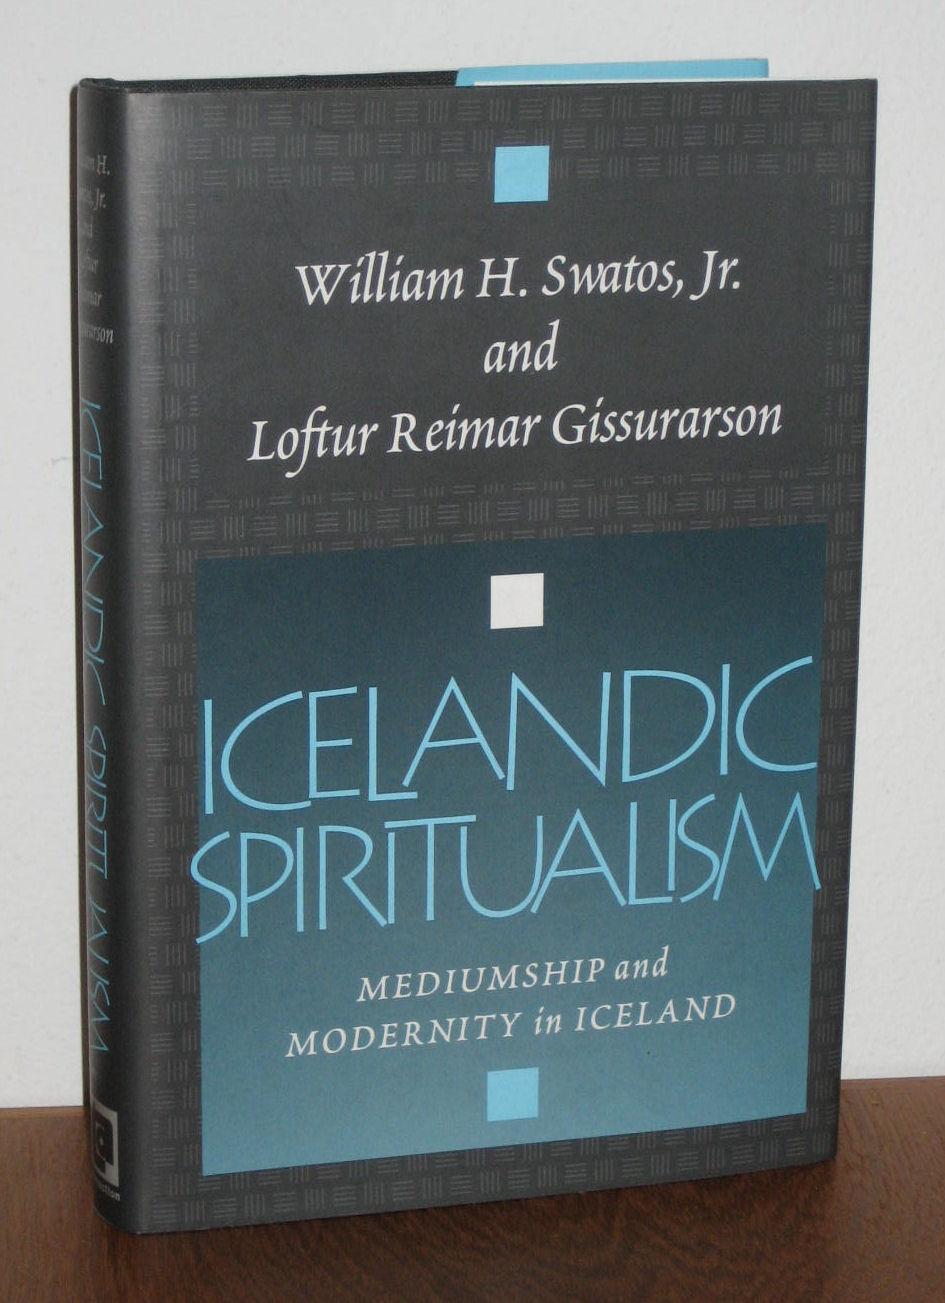 Icelandic Spiritualism: Mediumship and Modernity in Iceland: Swatos Jr., William H.; Gissurarson, ...